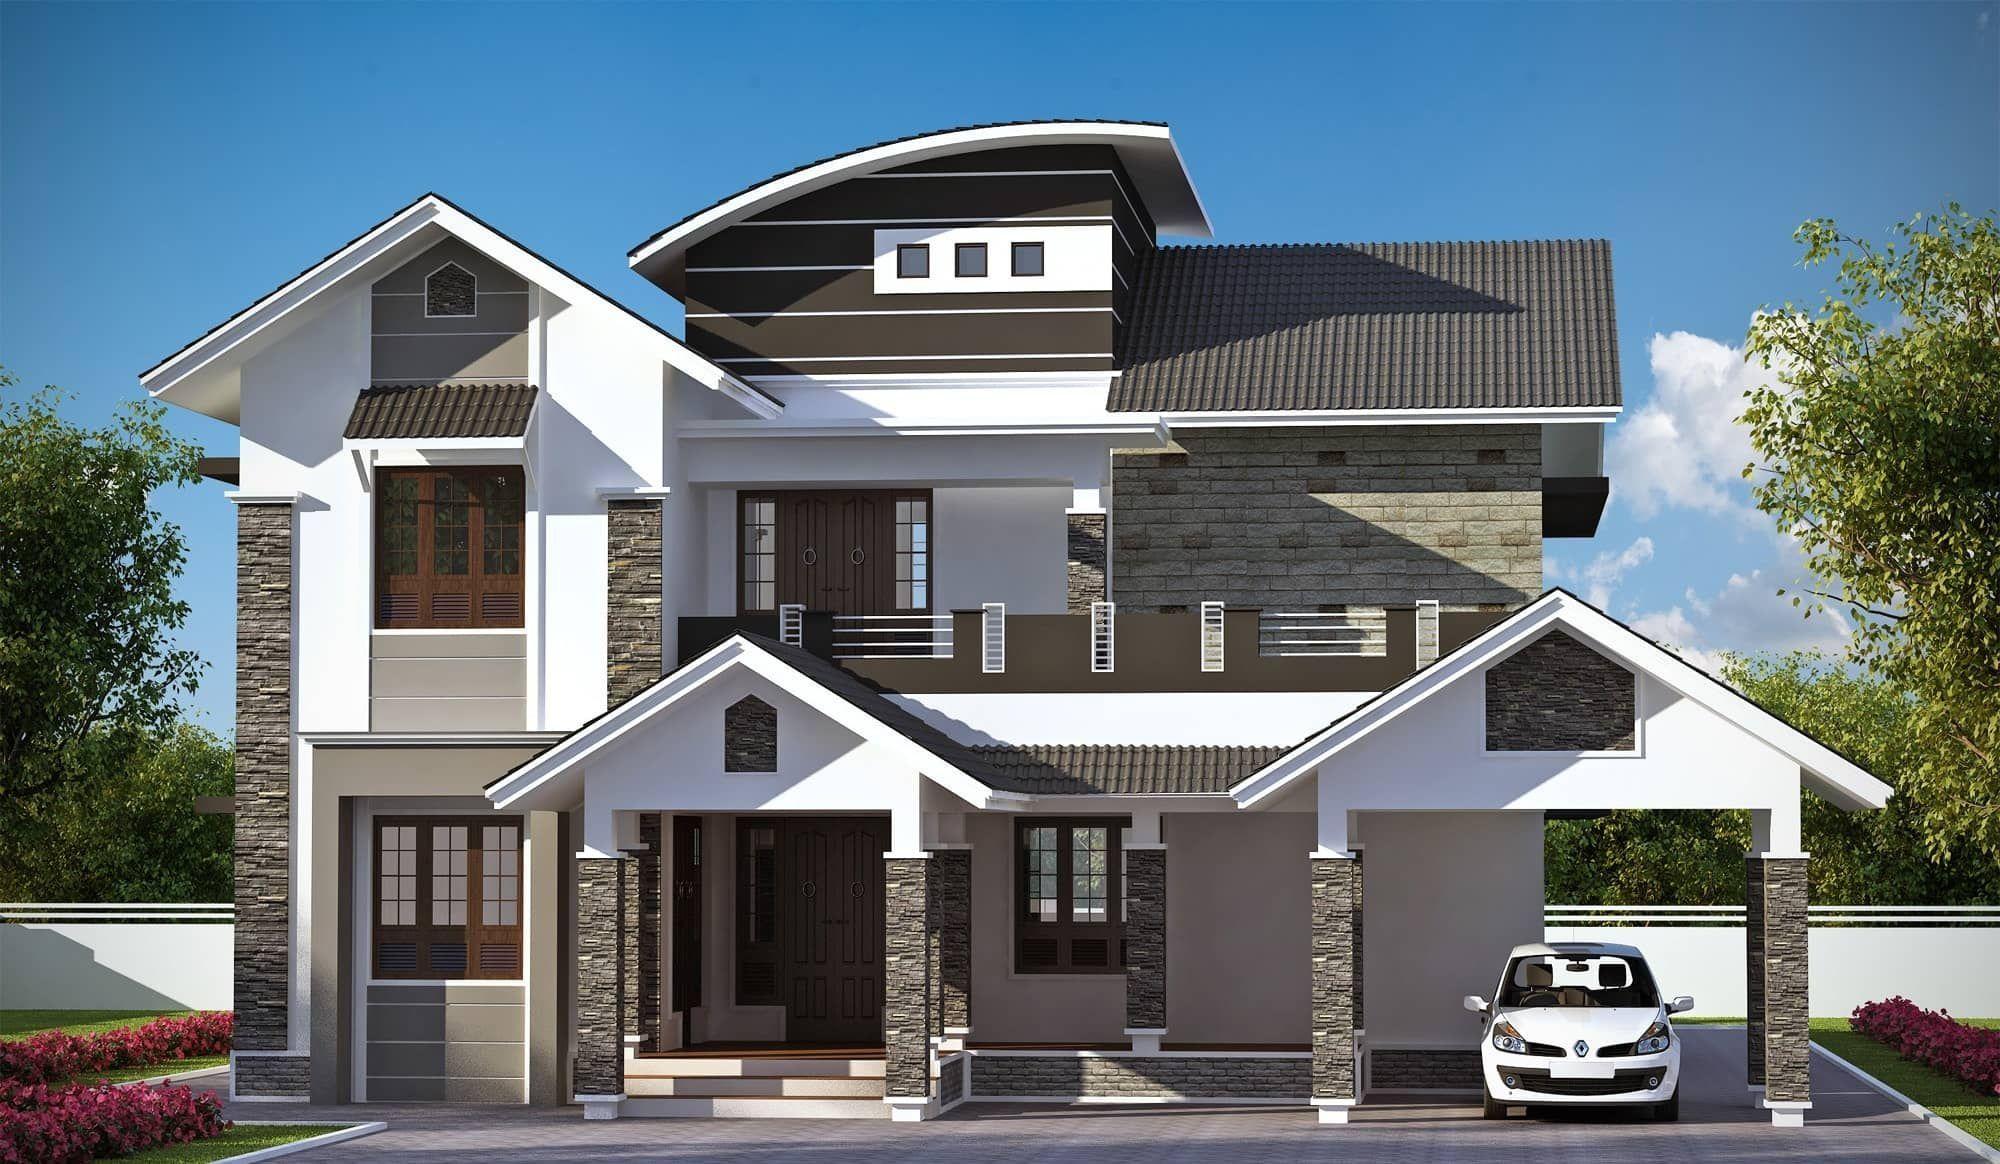 Best Dream Home Design Ideas 3 Kerala House Design Modern Style House Plans Dream Home Design